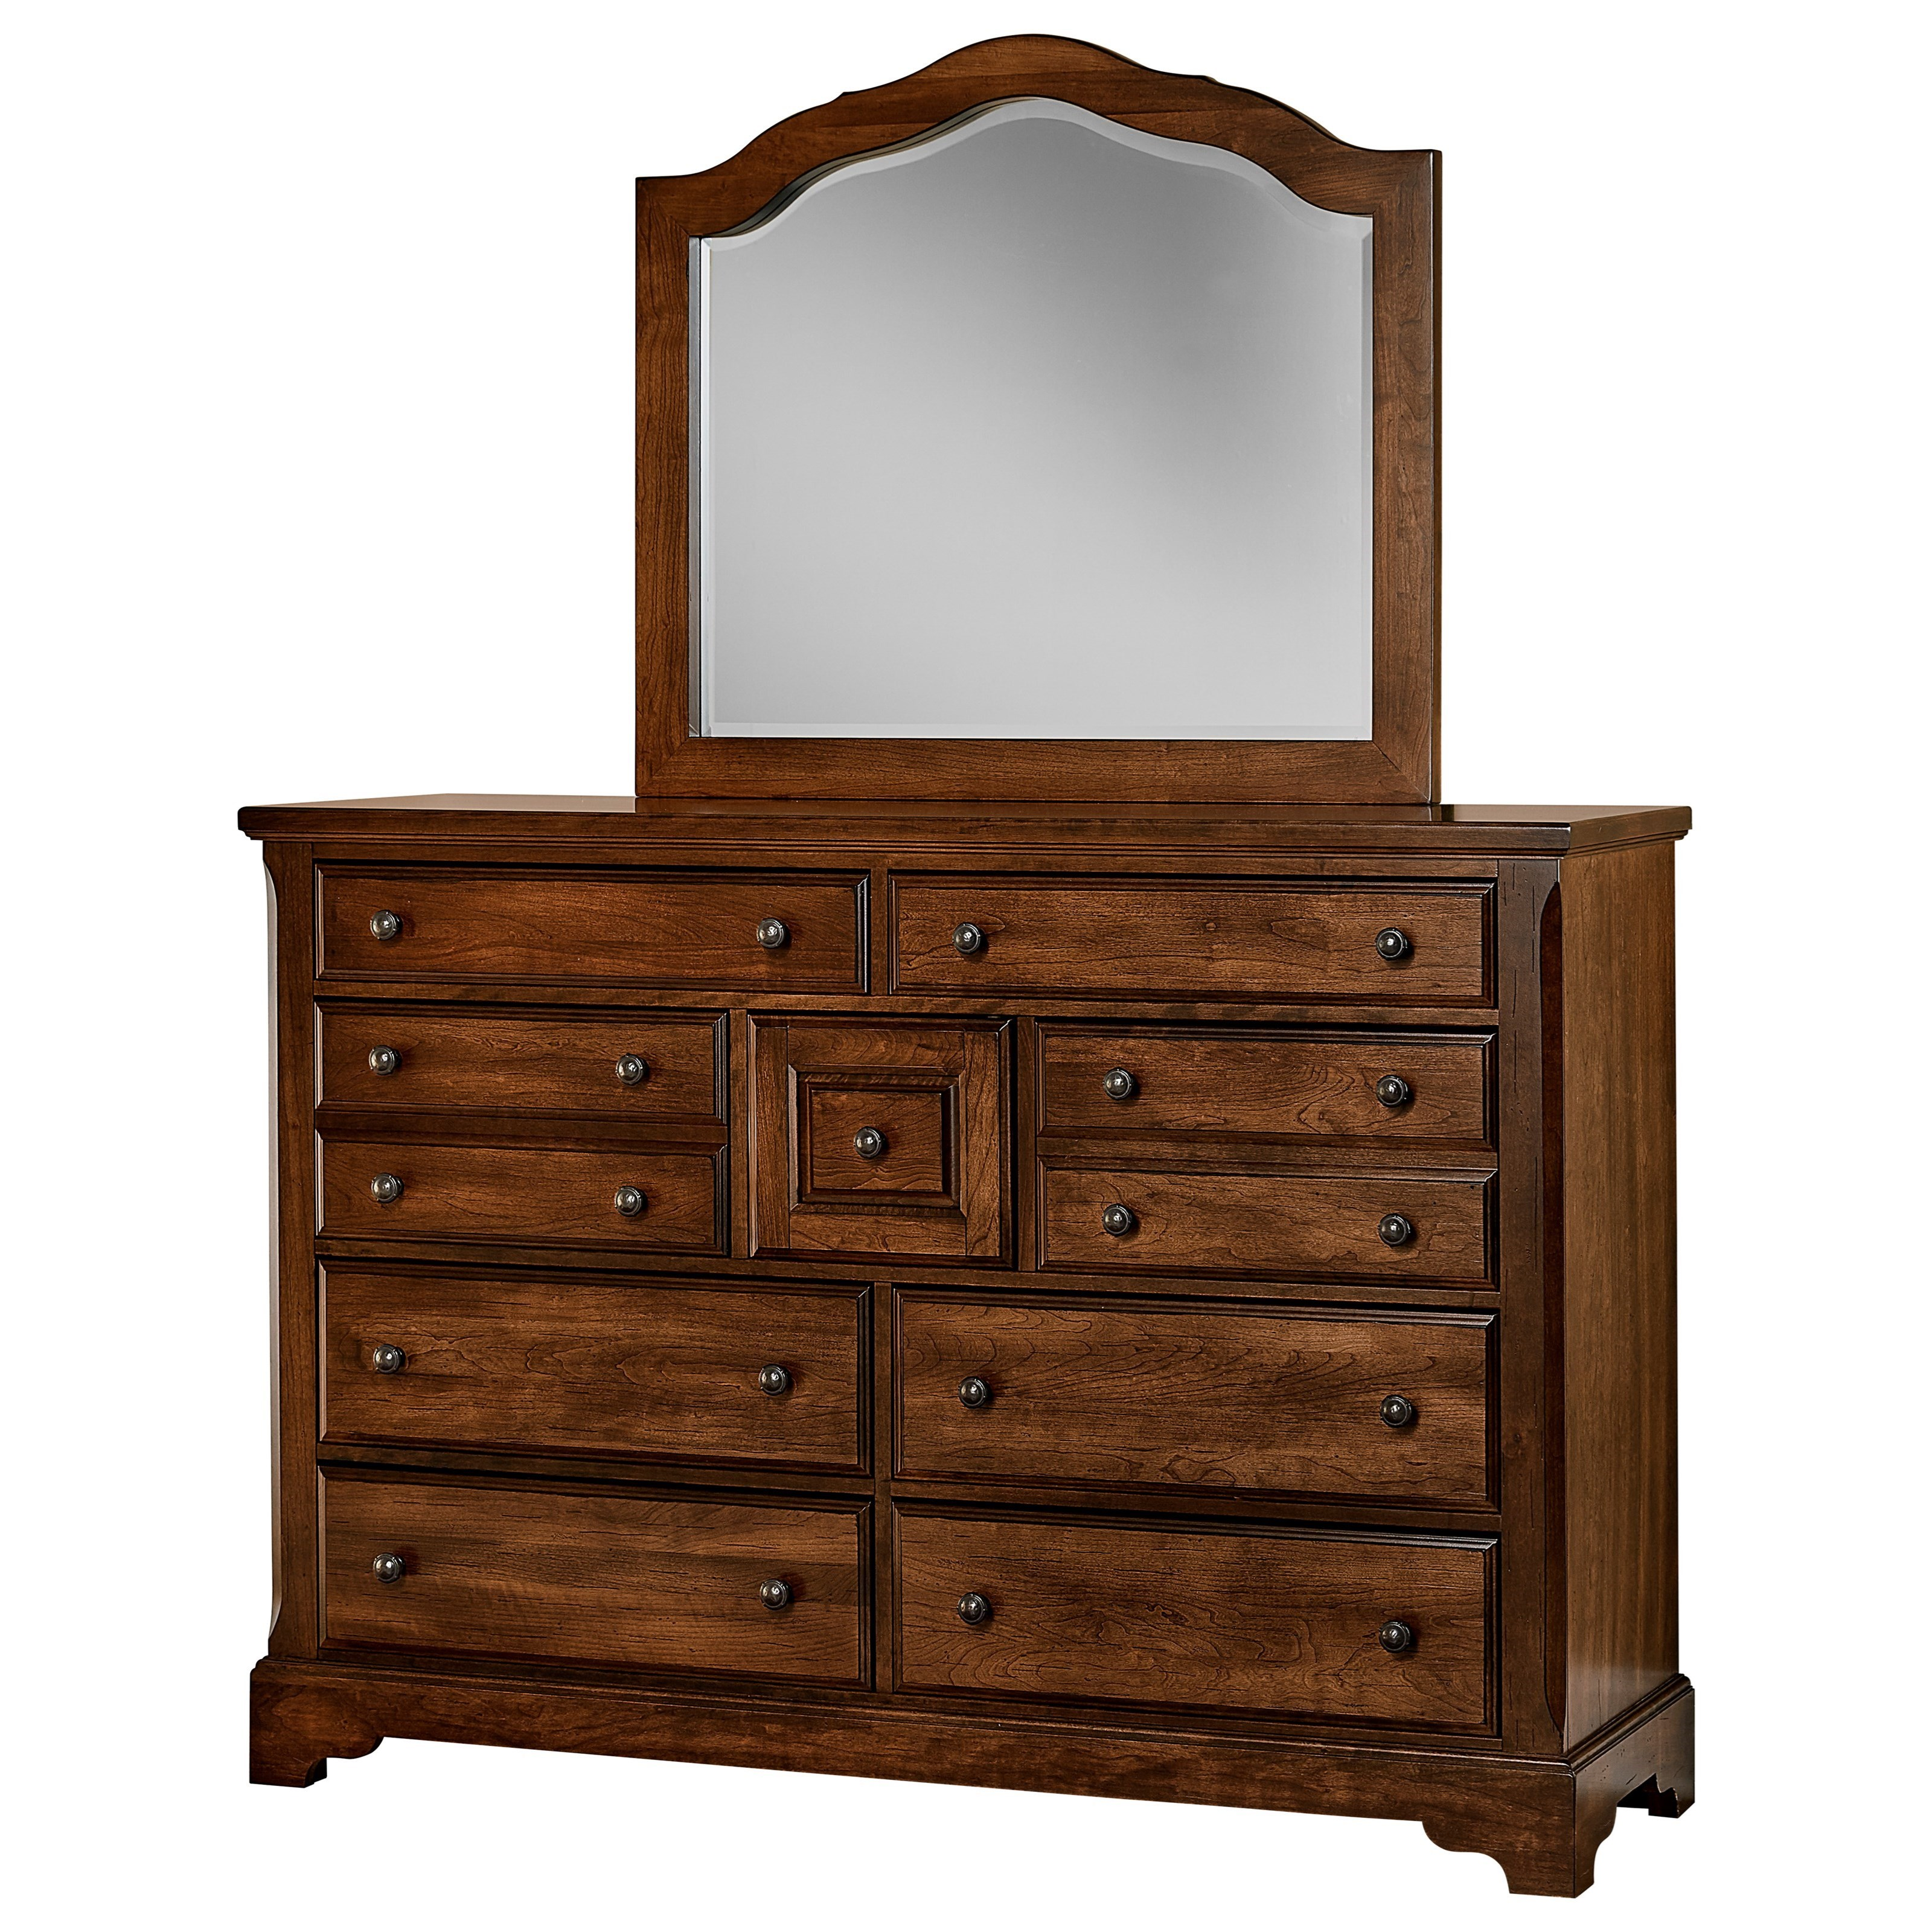 Artisan Choices Villa Triple Dresser & Arched Mirror by Artisan & Post at Lapeer Furniture & Mattress Center